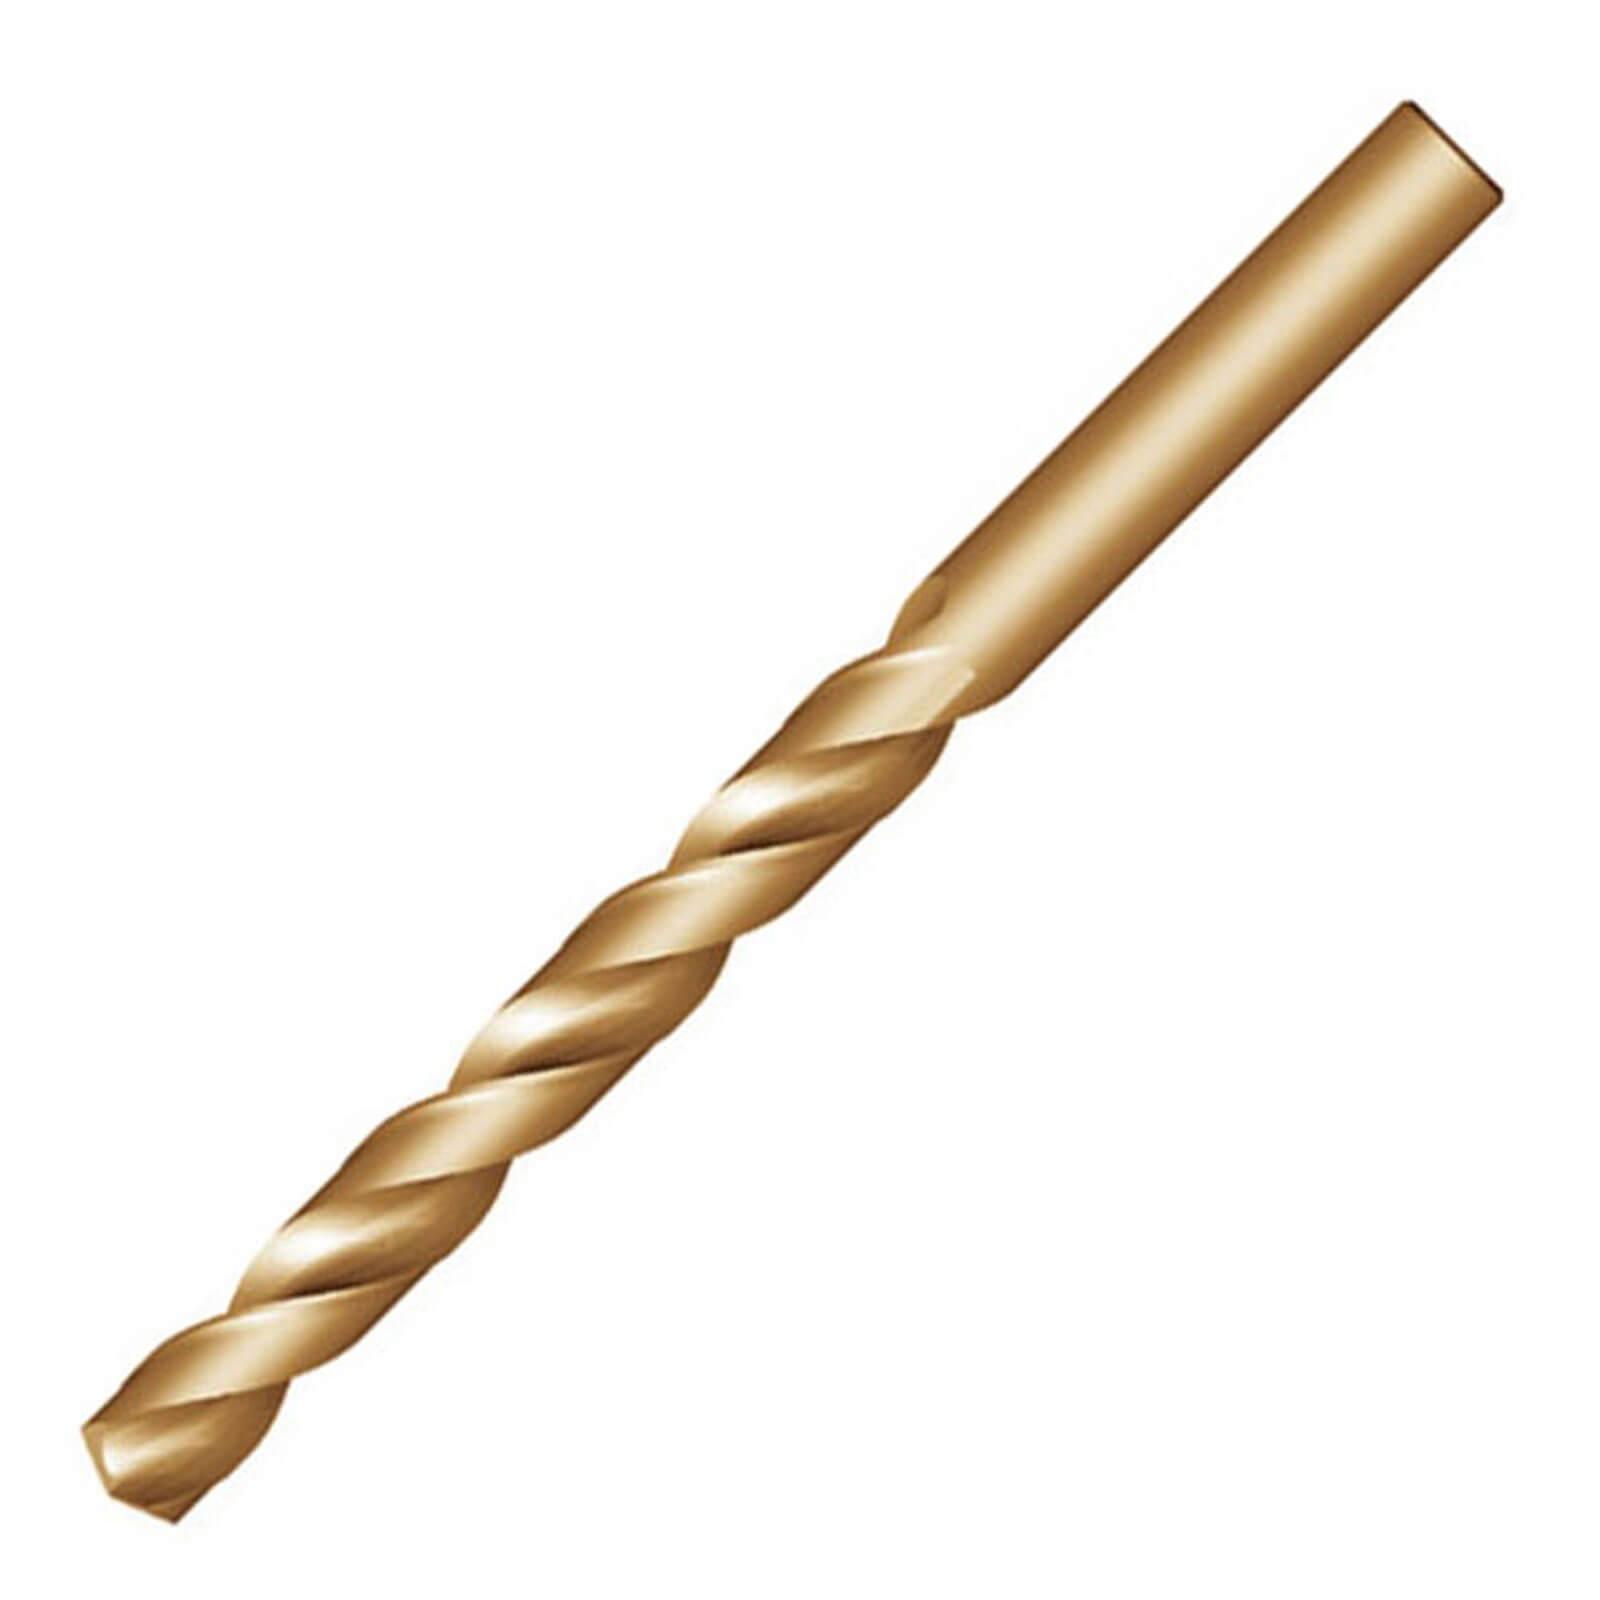 Dormer A7776.5 NAS907J Jobber Drill Cobalt High Speed Steel Bronze Coating 6.5 mm Head Diameter Pack of 10 63 mm Flute Length